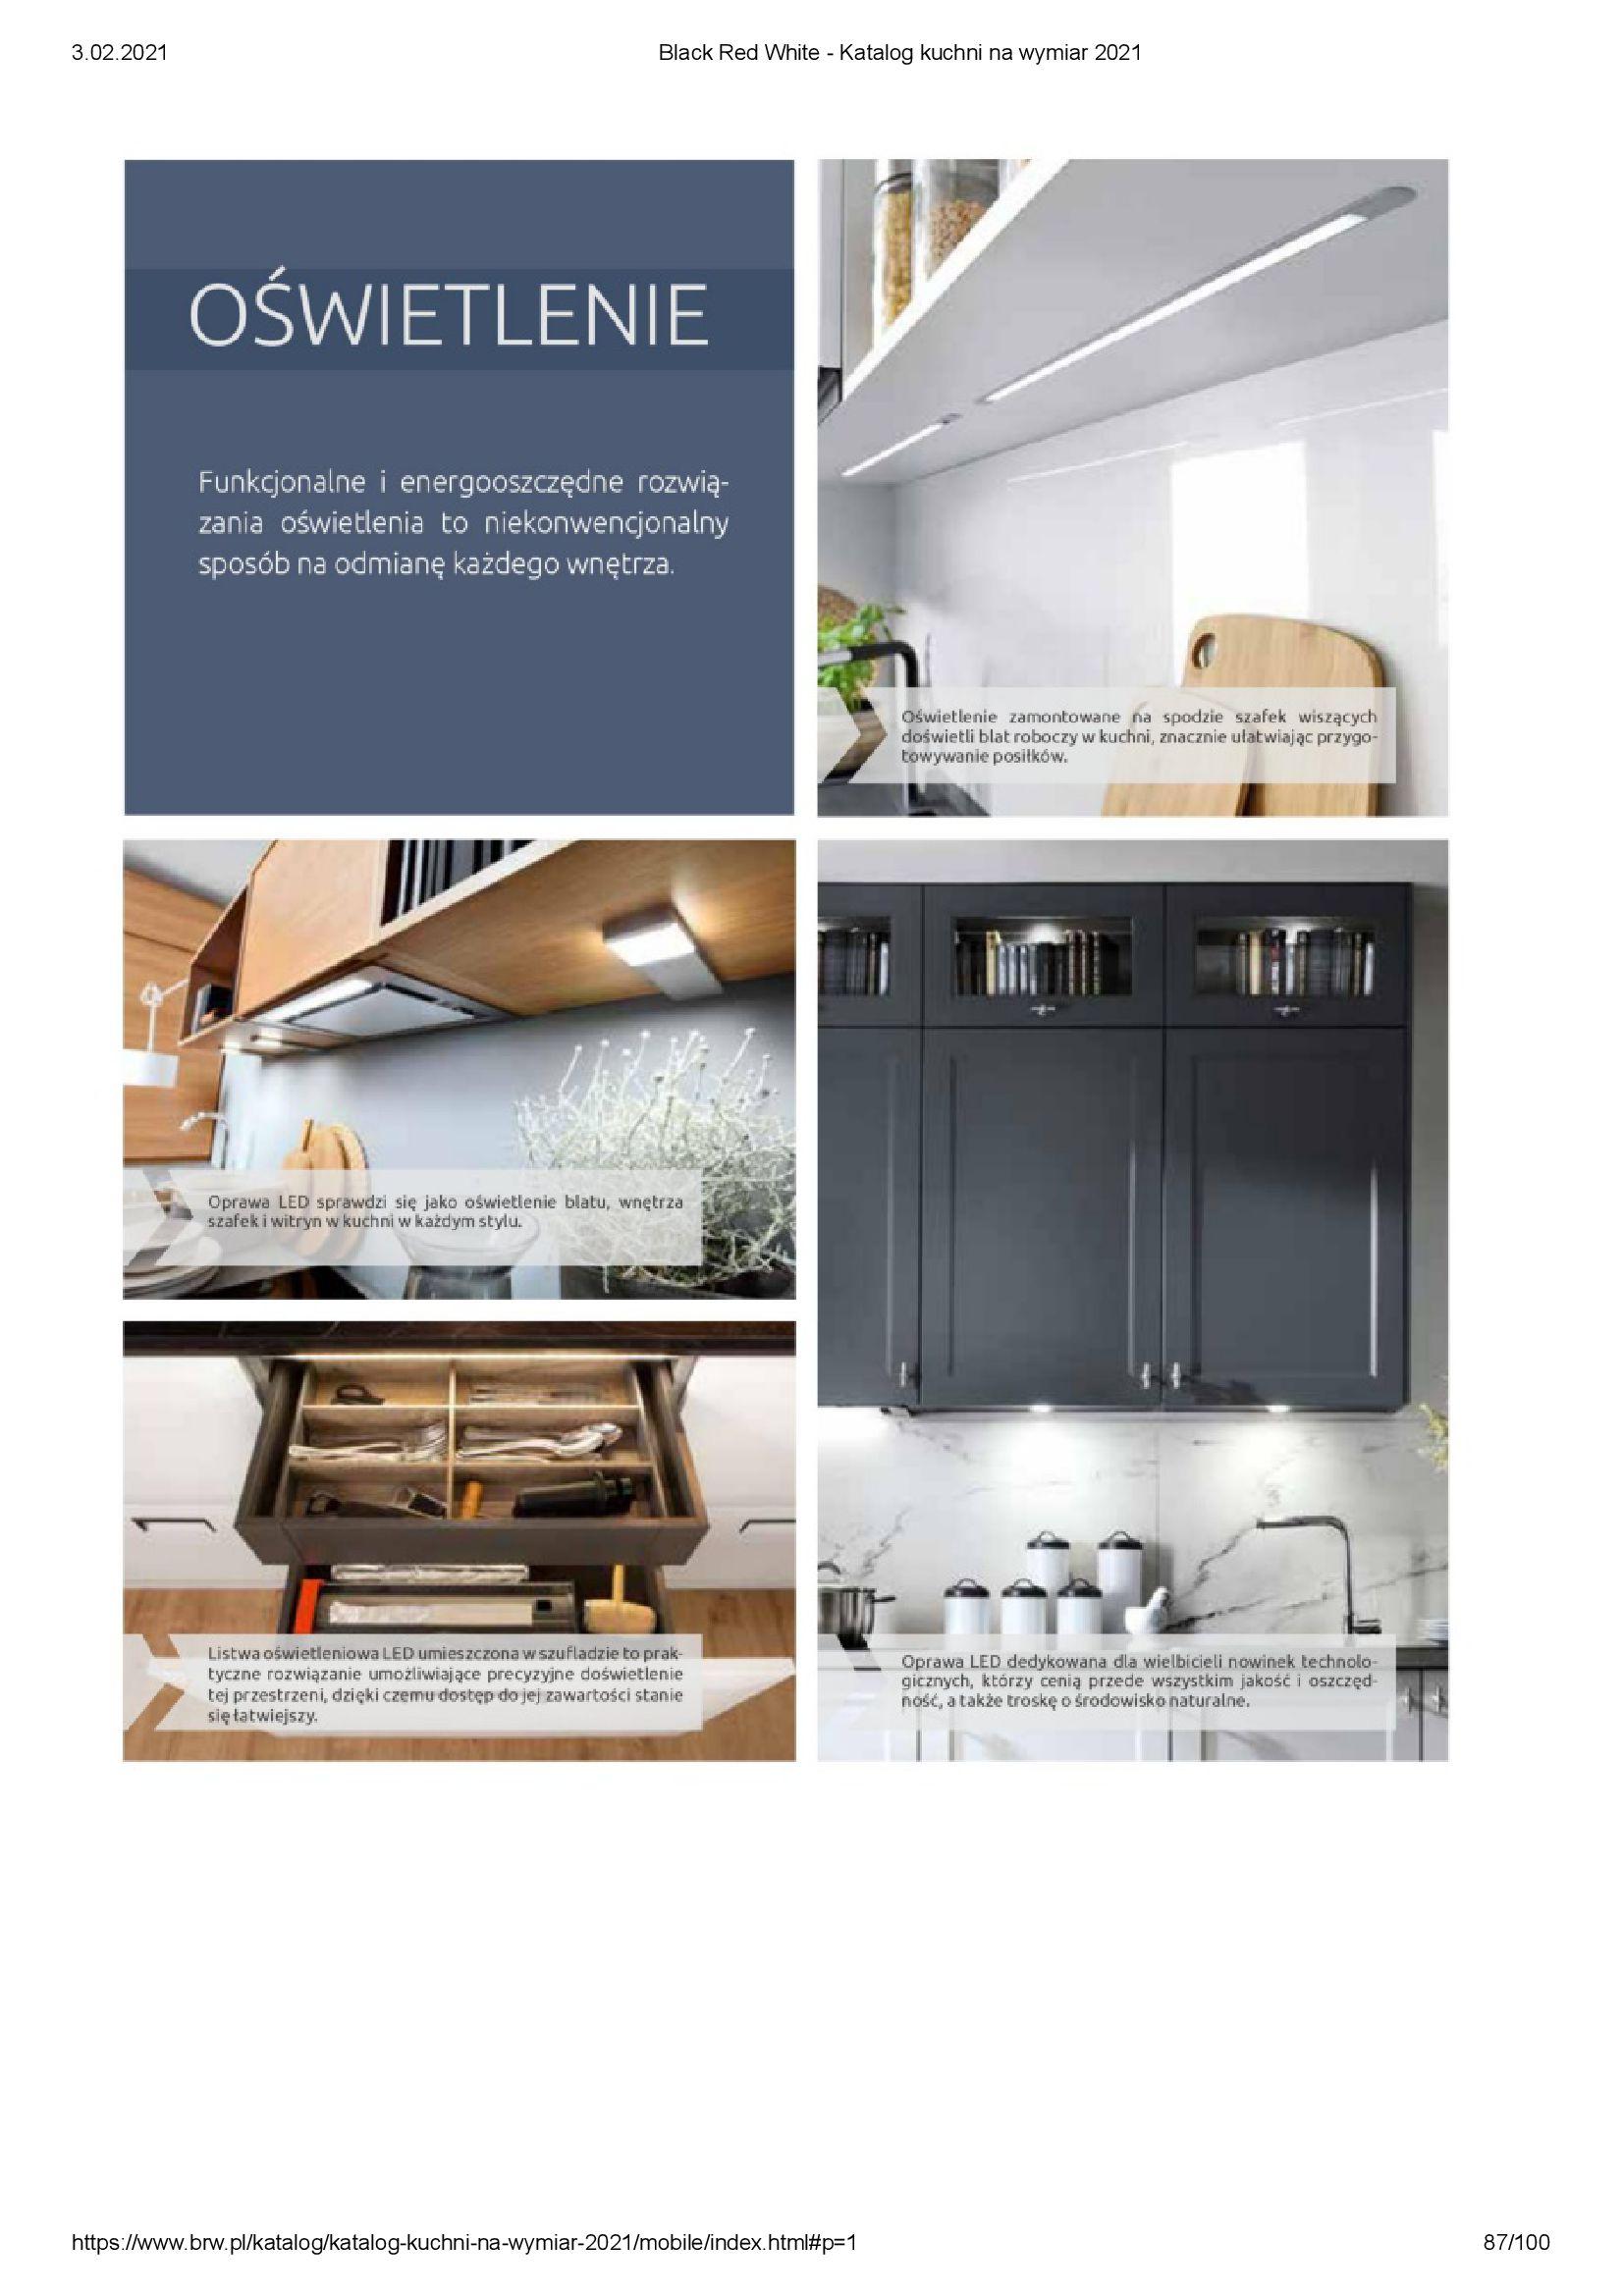 Gazetka Black Red White: Katalog - Kuchnie na wymiar Senso Kitchens 2021 2021-01-01 page-87